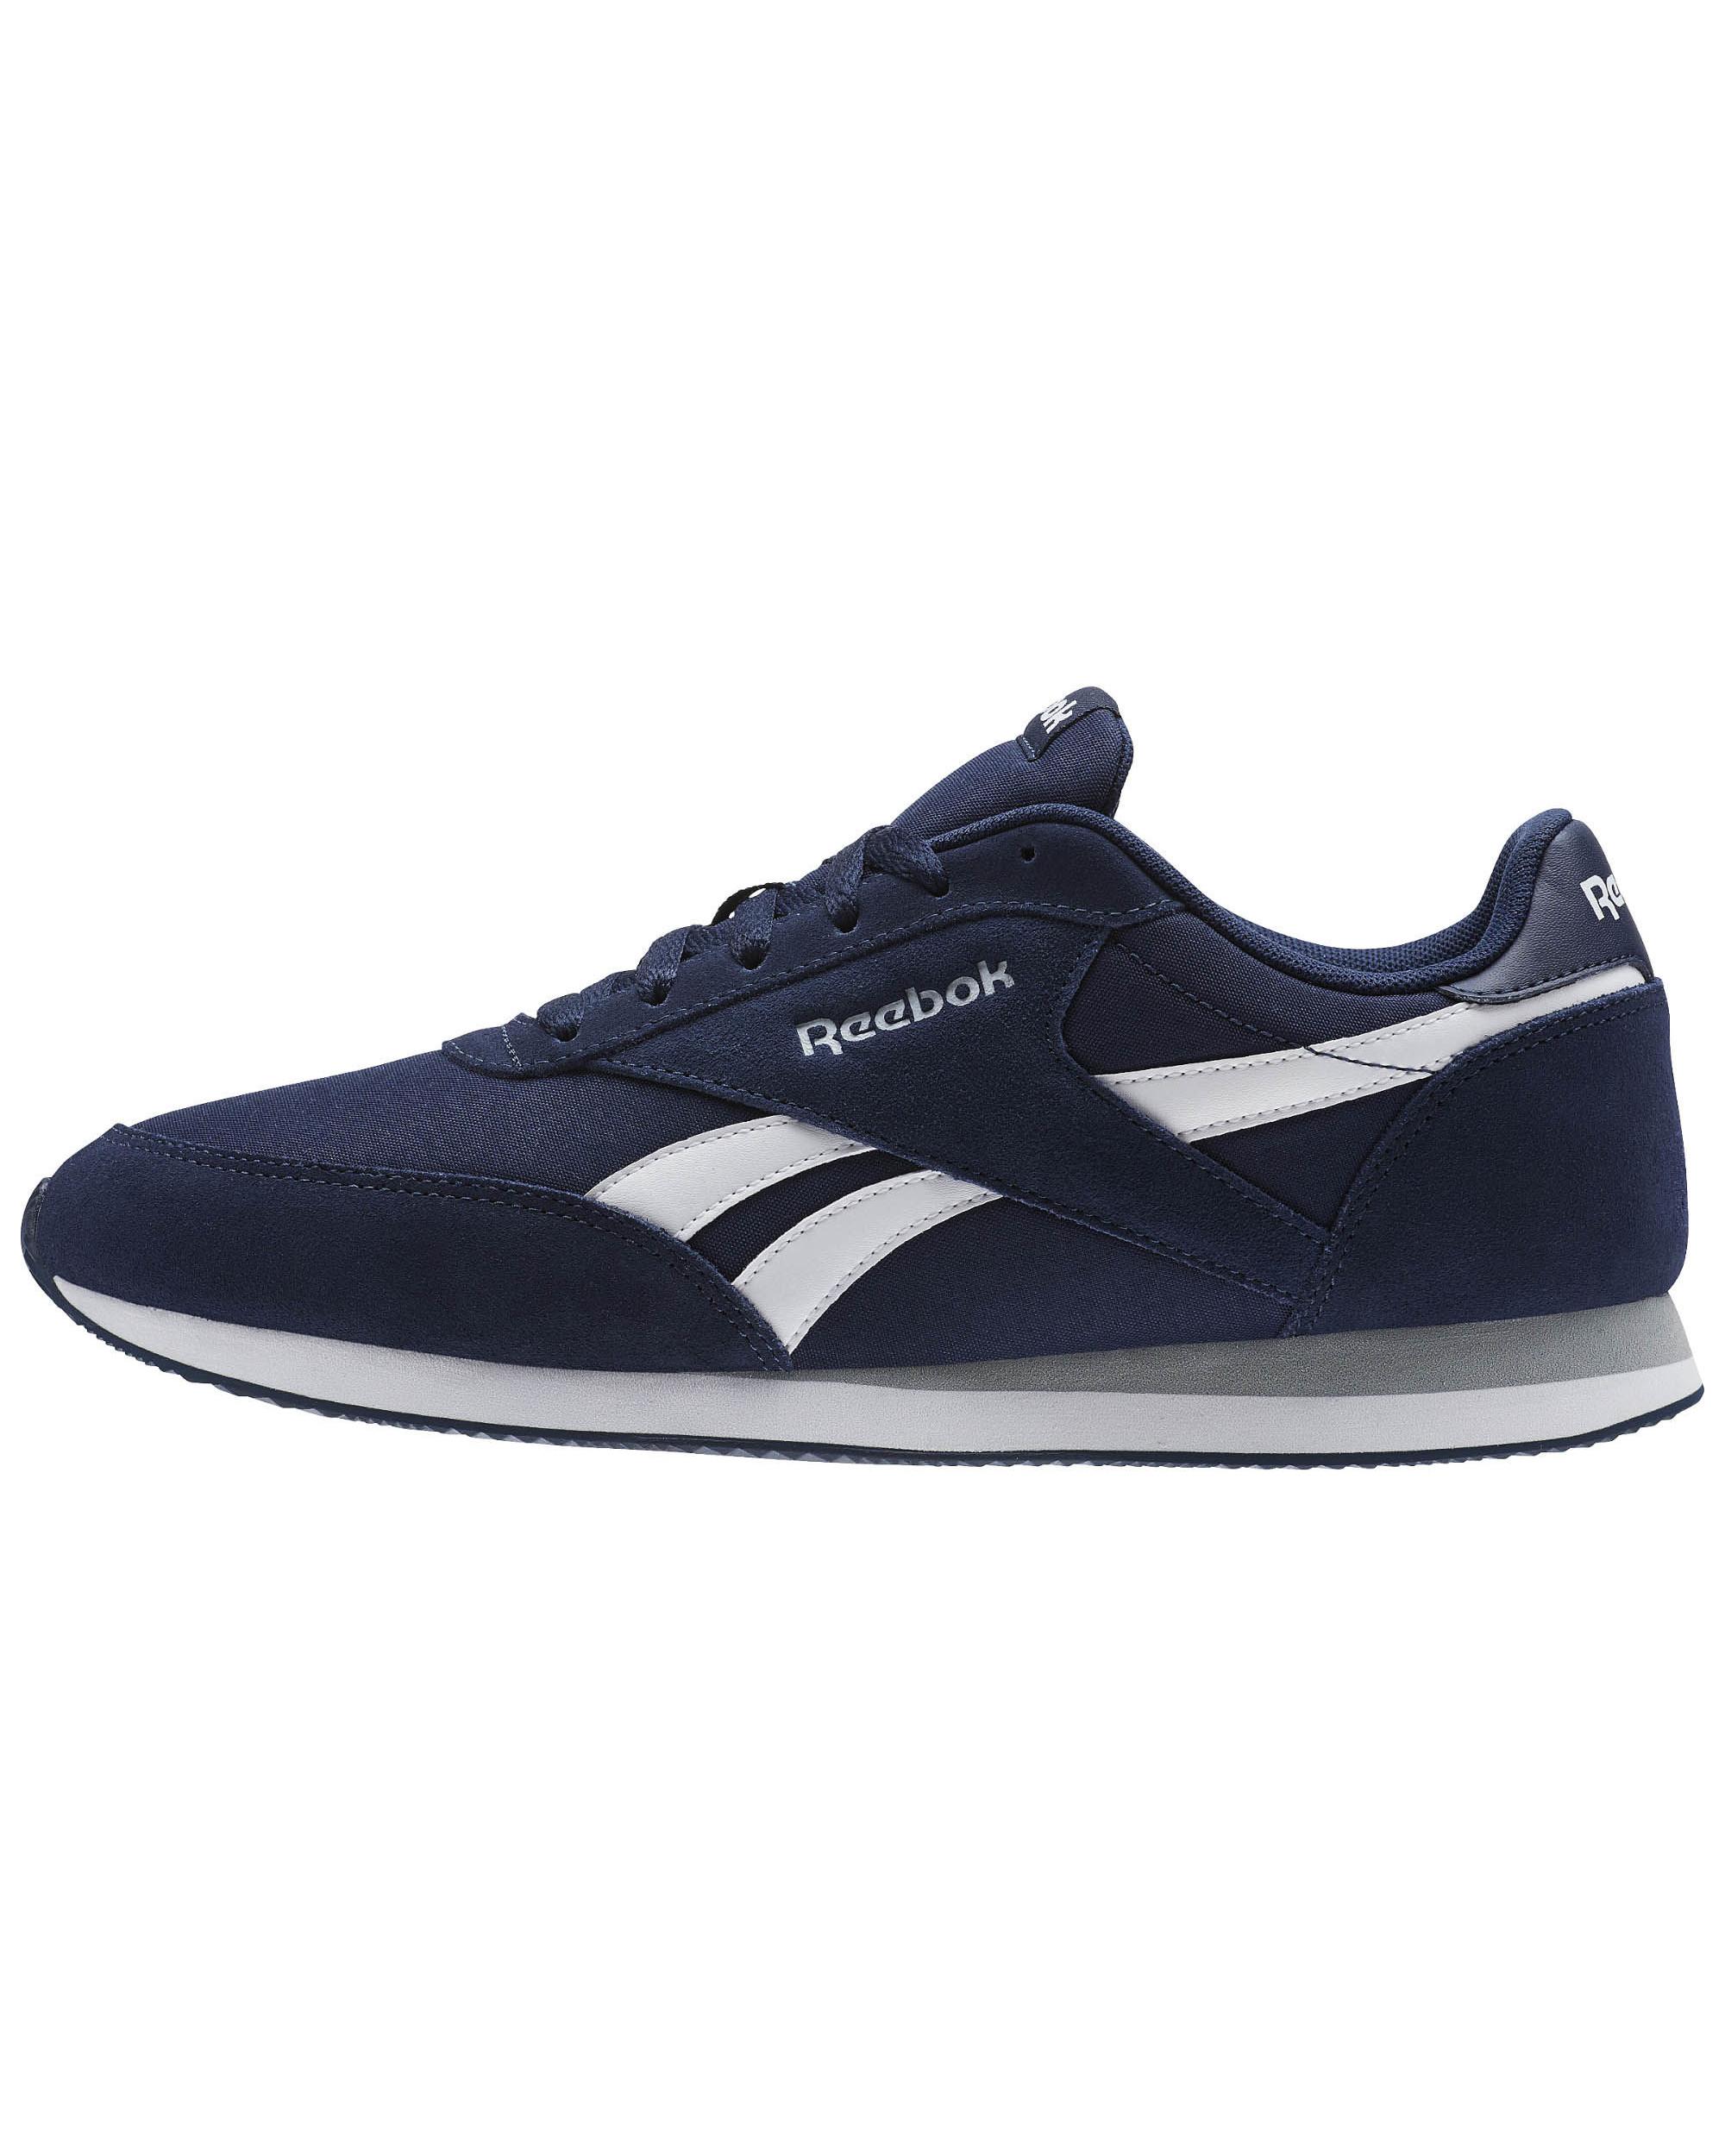 Reebok Scarpe Sneakers Sportive Royal classic jogger Blu Uomo | eBay